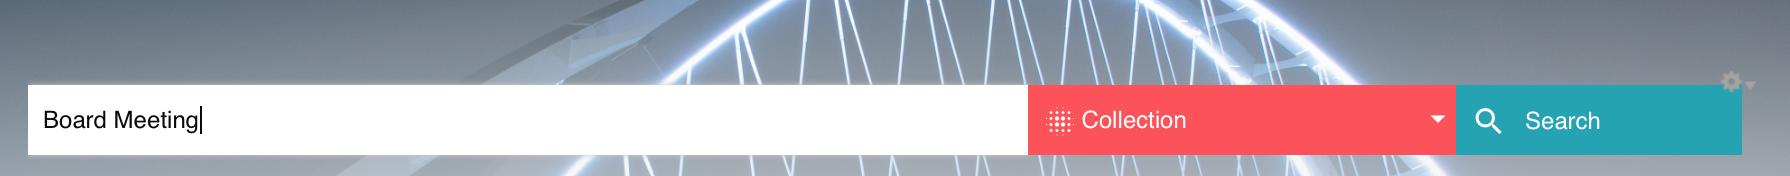 search bar option